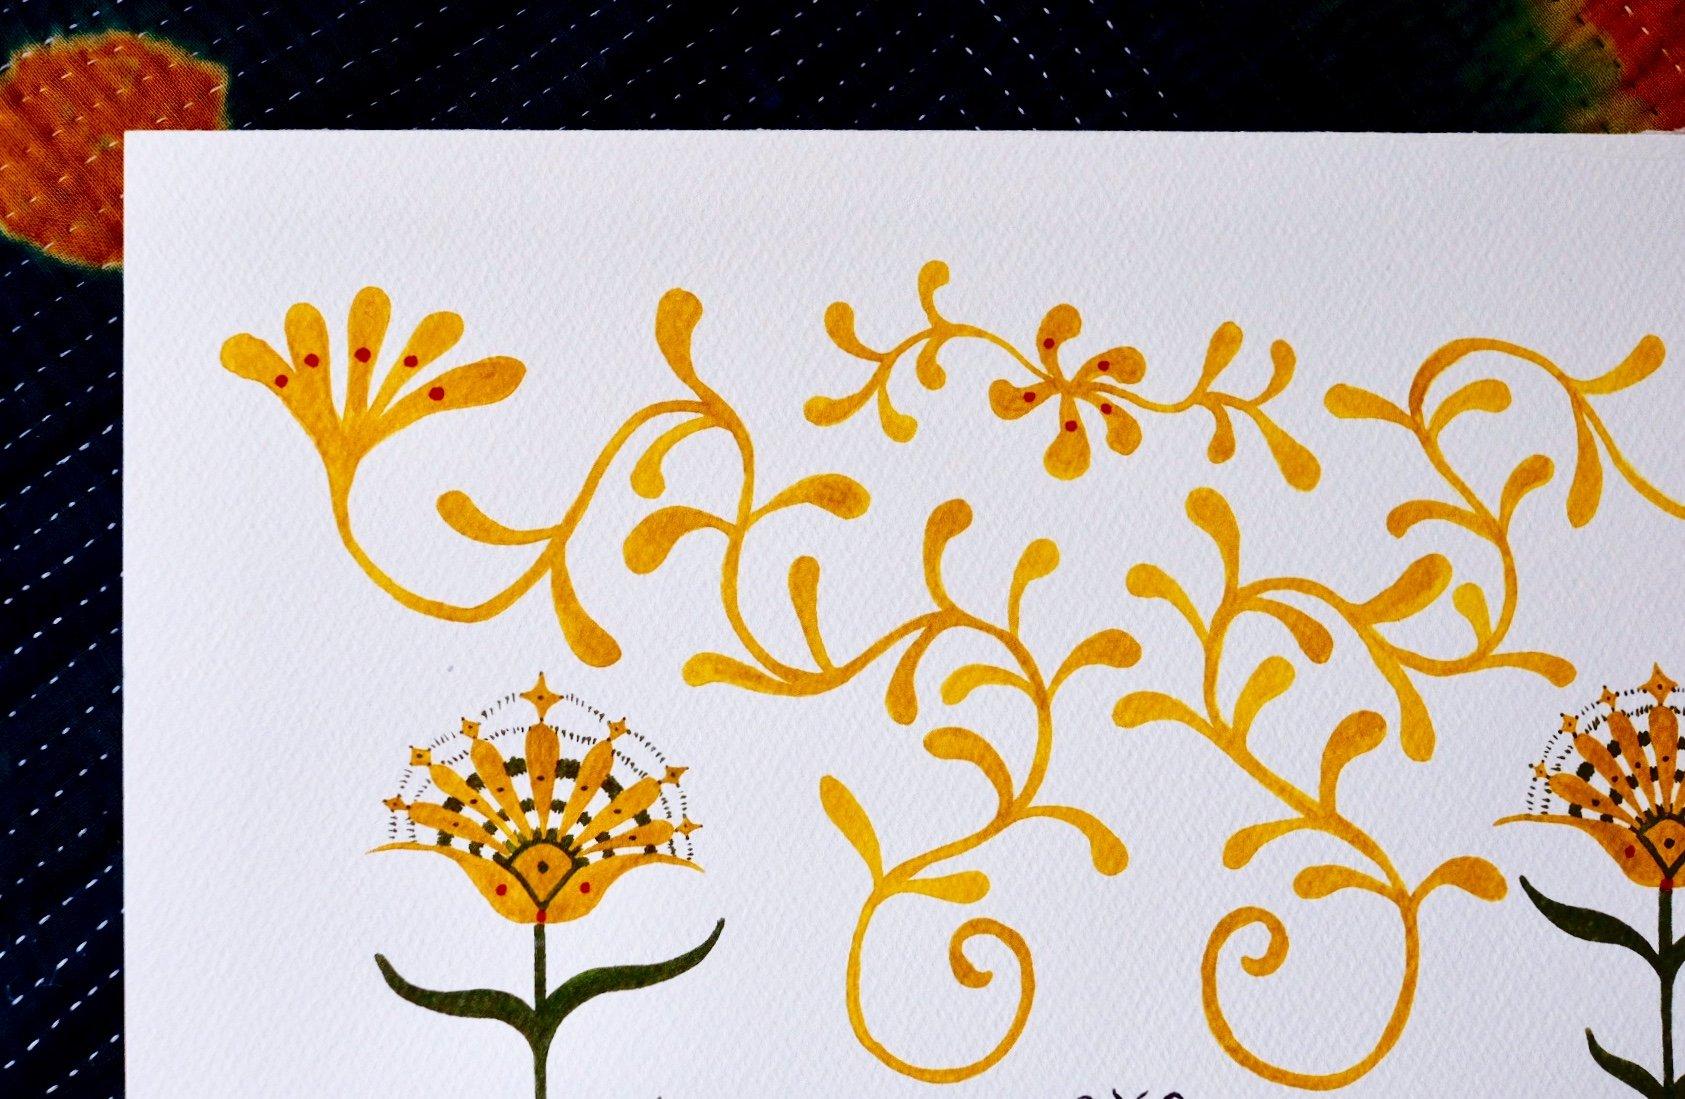 Image of flowers of sunlight